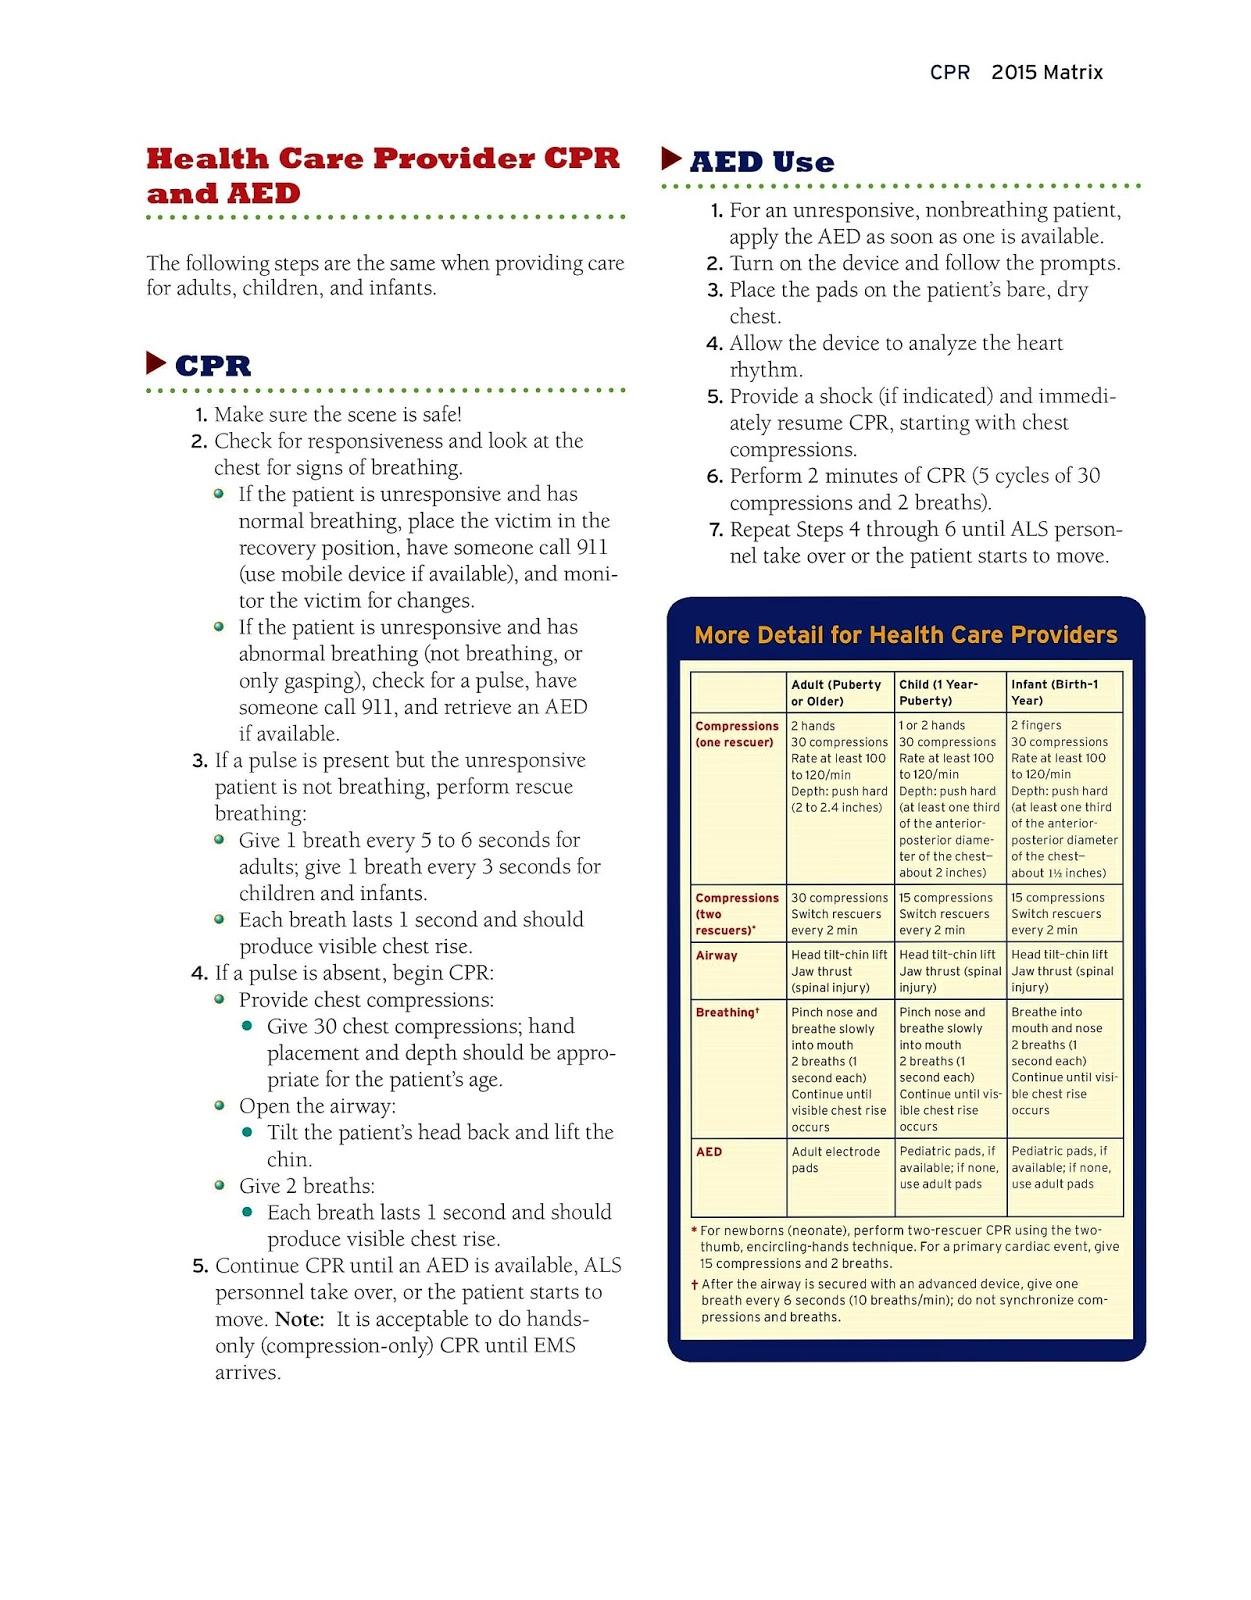 aha cpr guidelines 2015 pdf